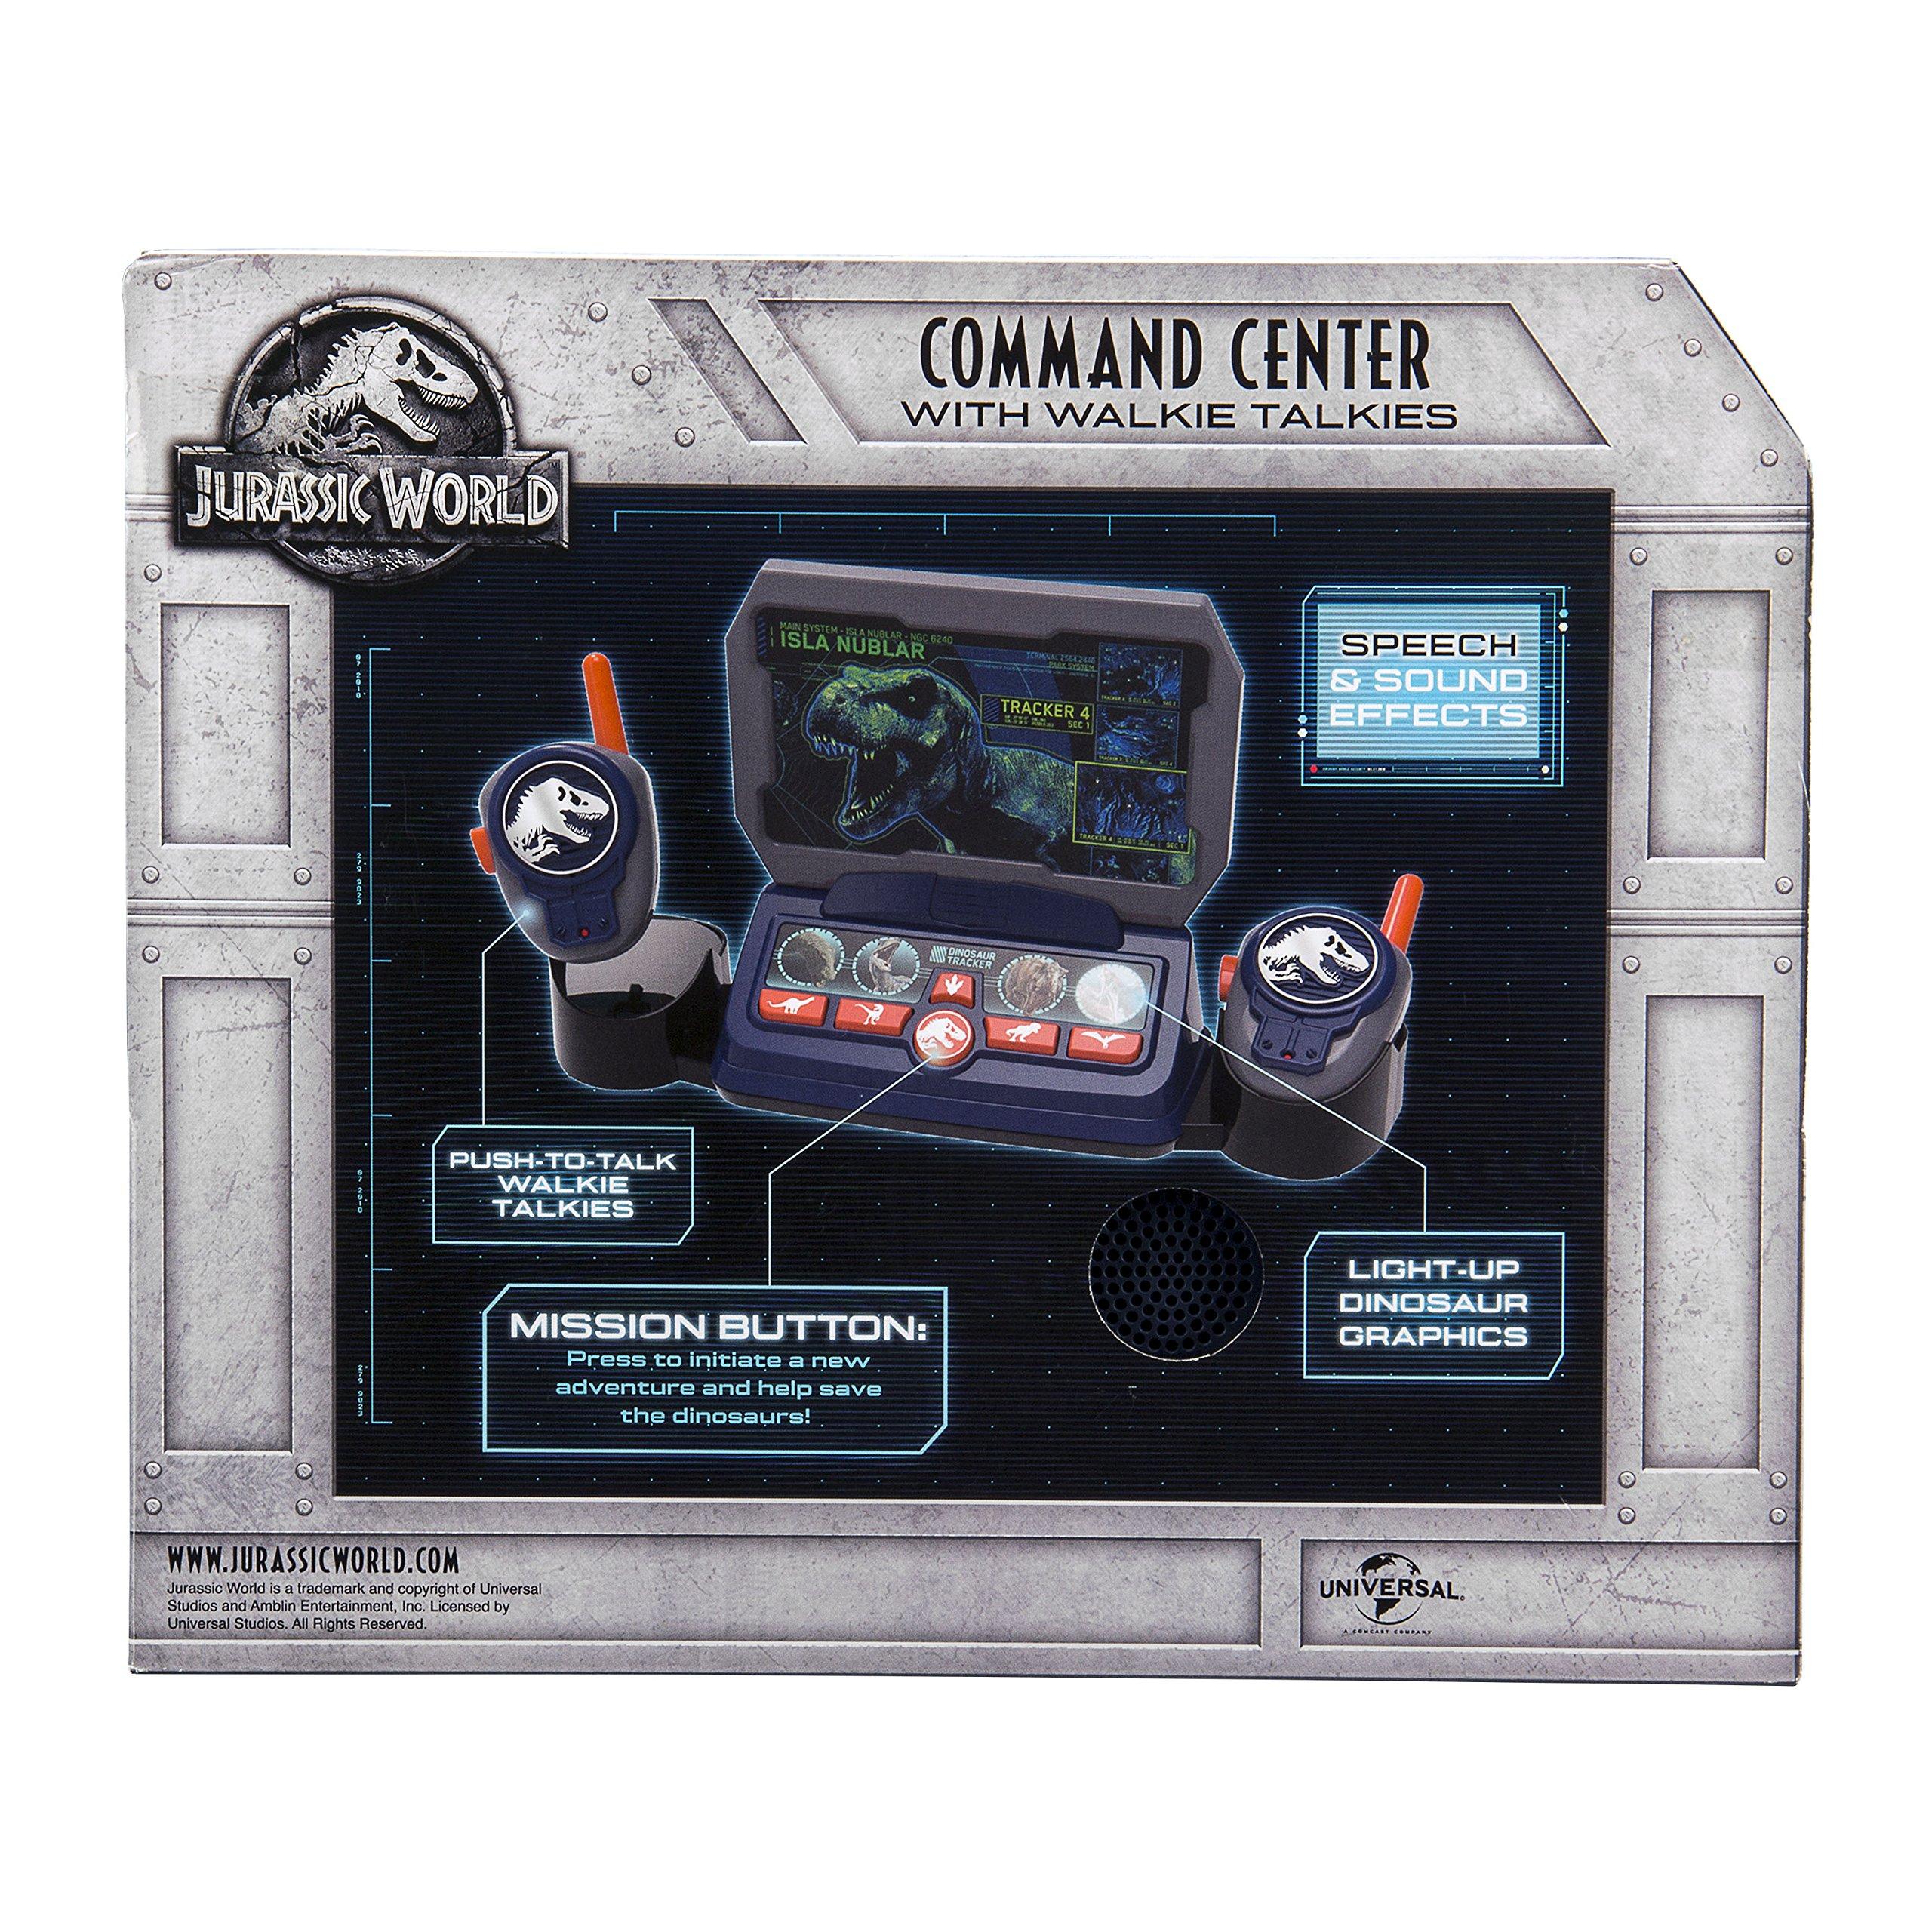 eKids Jurassic World 2 Command Center with Kid Friendly Walkie Talkies and Speech & Sound Effects by eKids (Image #6)